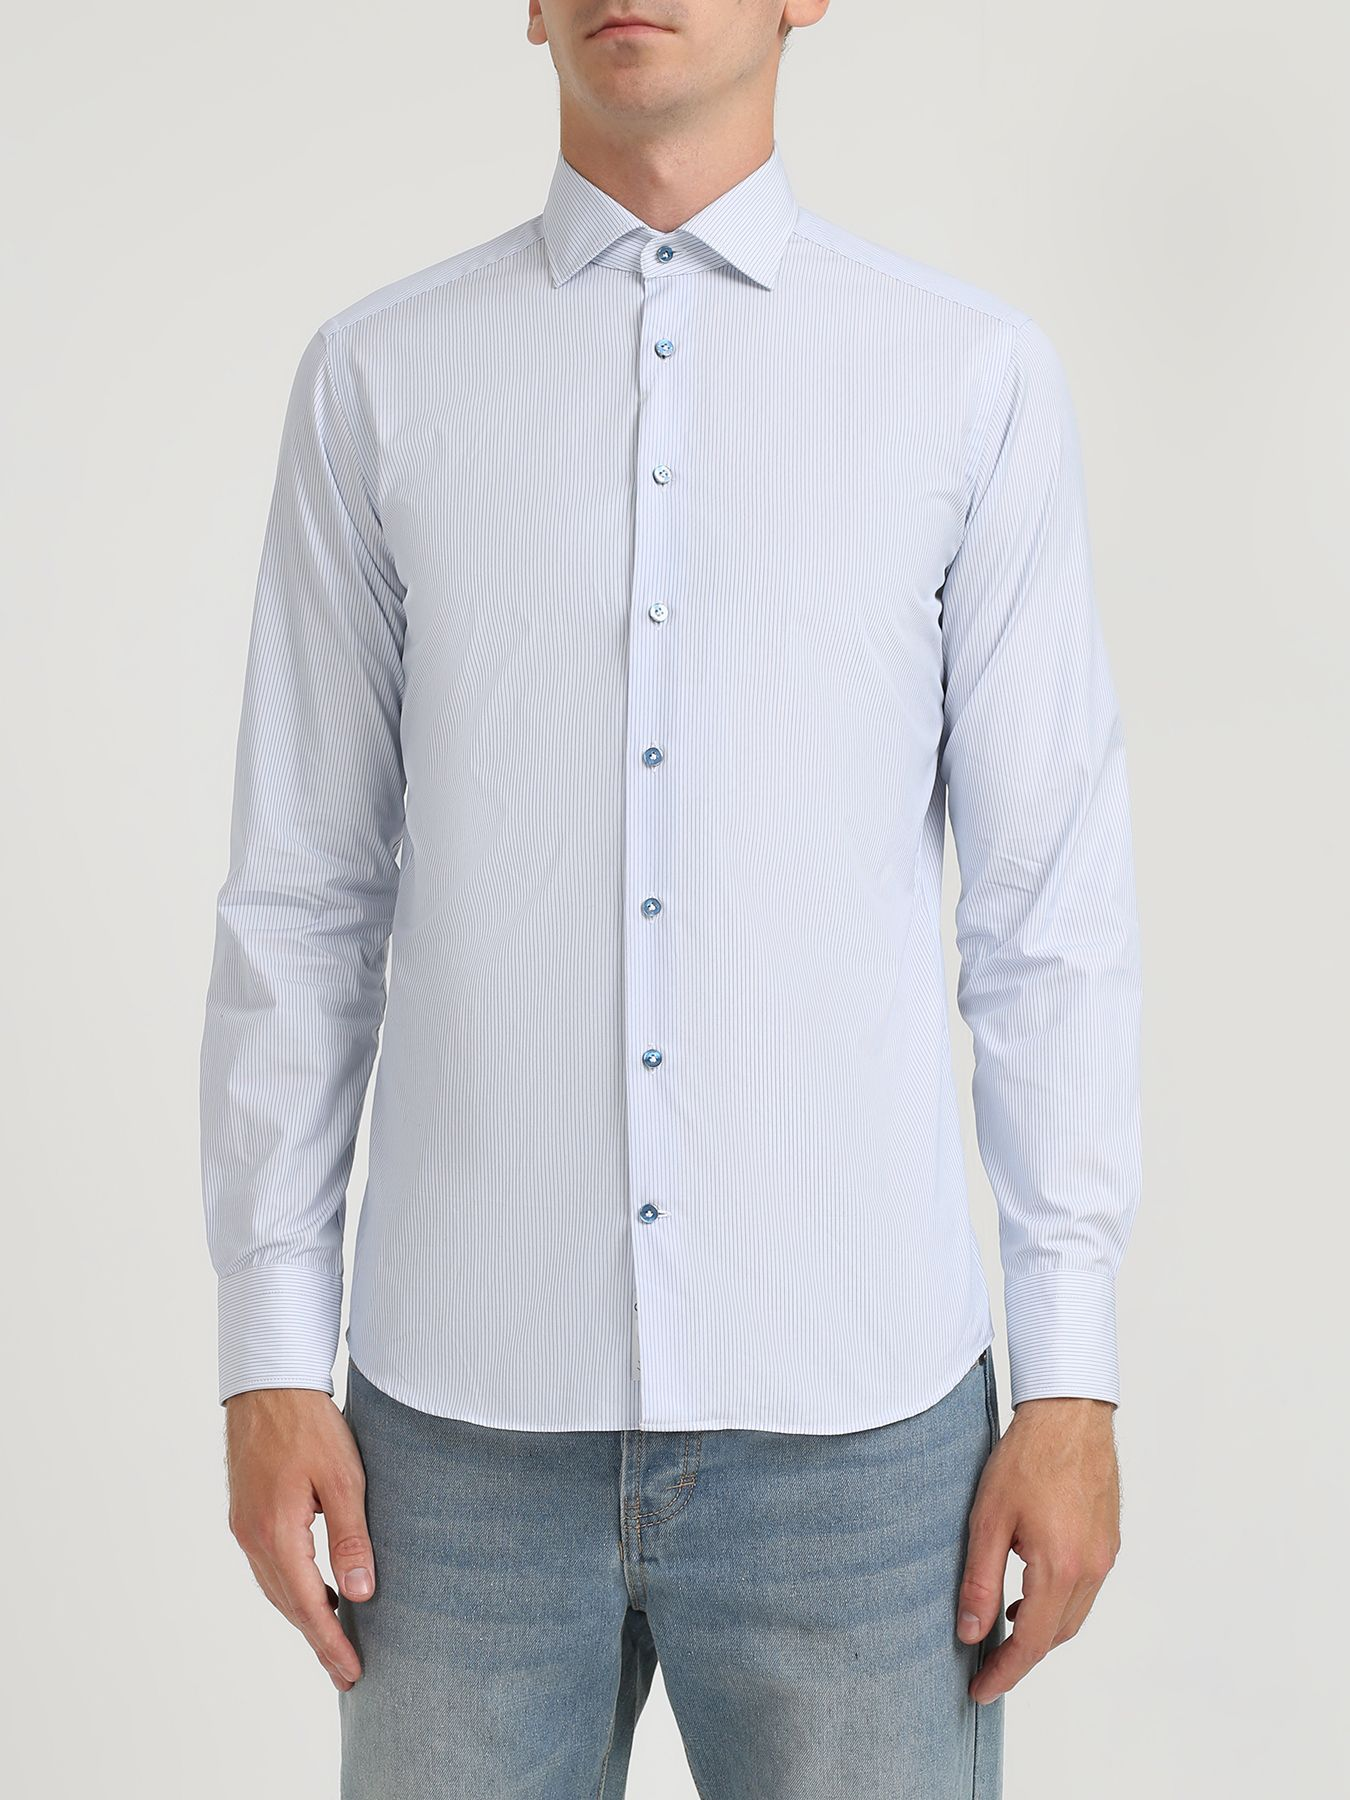 ночная рубашка с принтом в полоску Рубашки Korpo Хлопковая рубашка в полоску